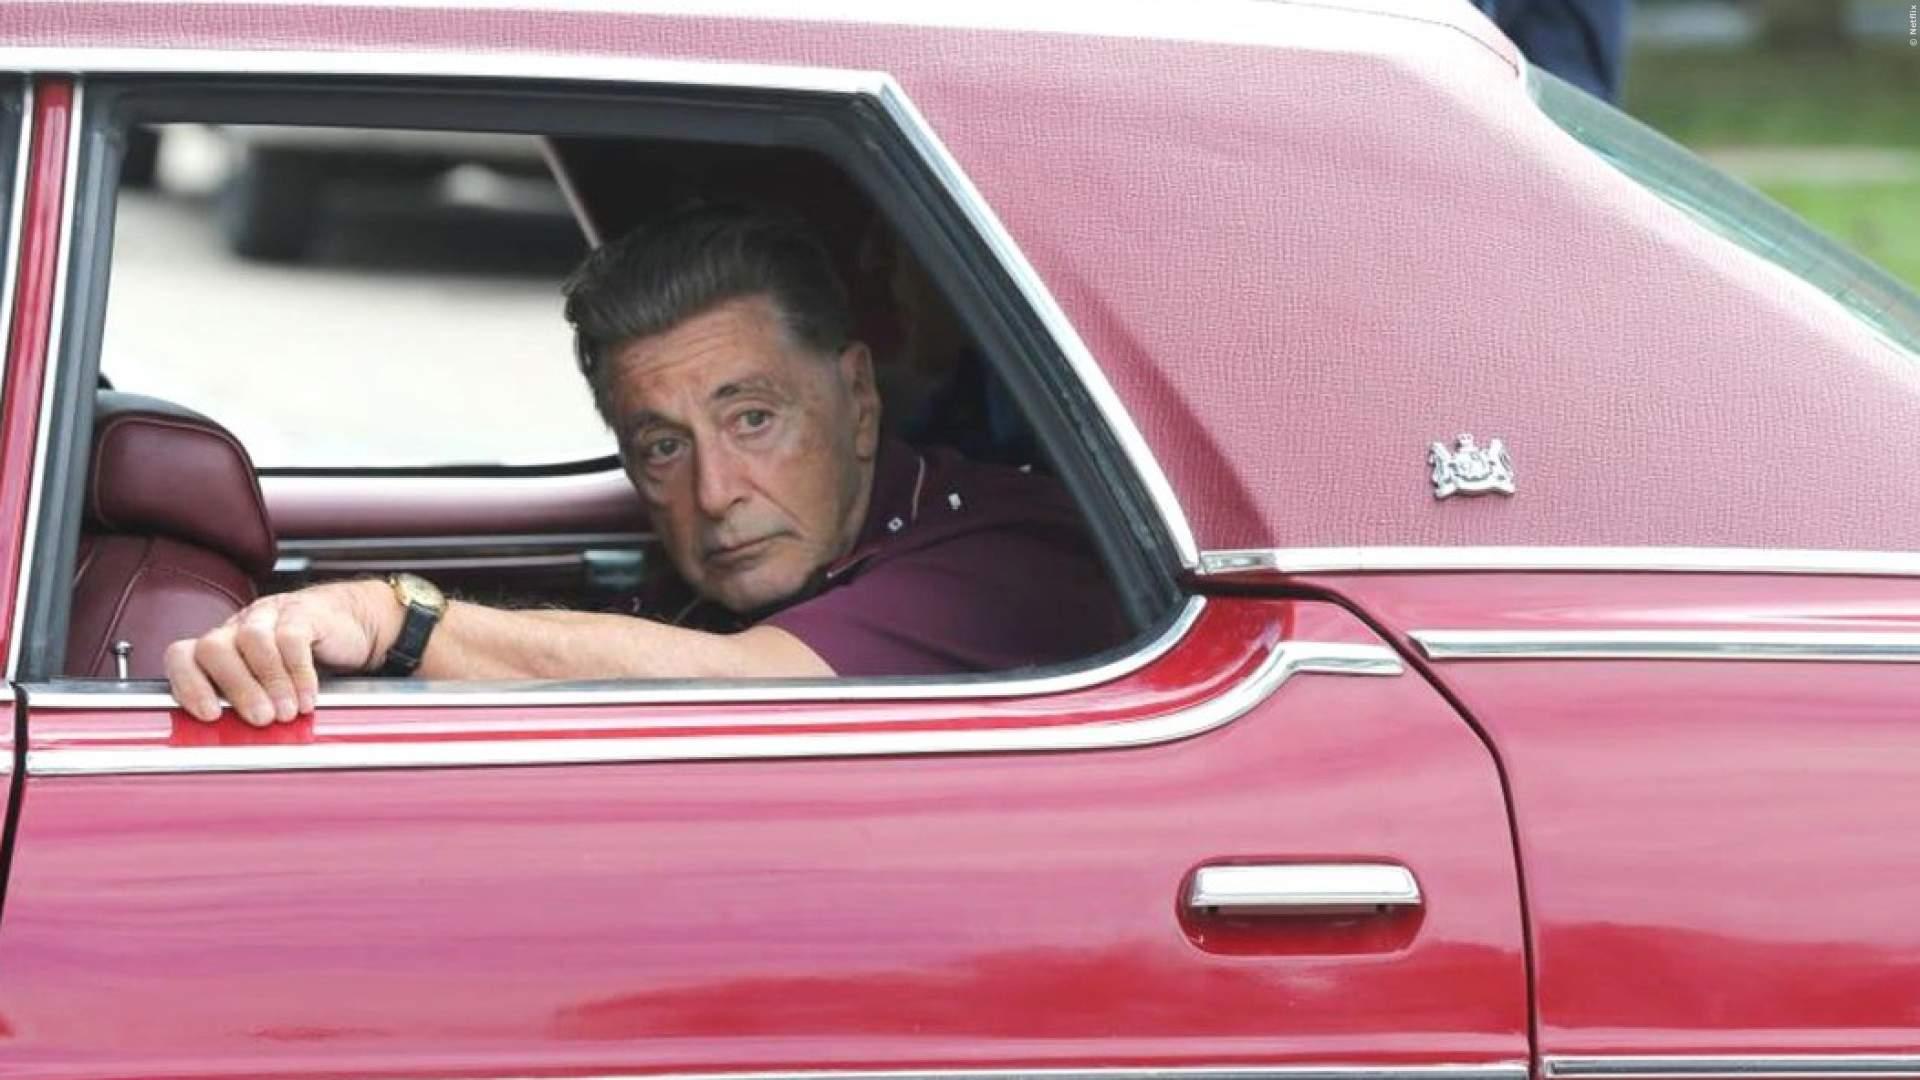 KULT-Comeback: Robert De Niro und Al Pacino im ersten Trailer zu 'The Irishman'